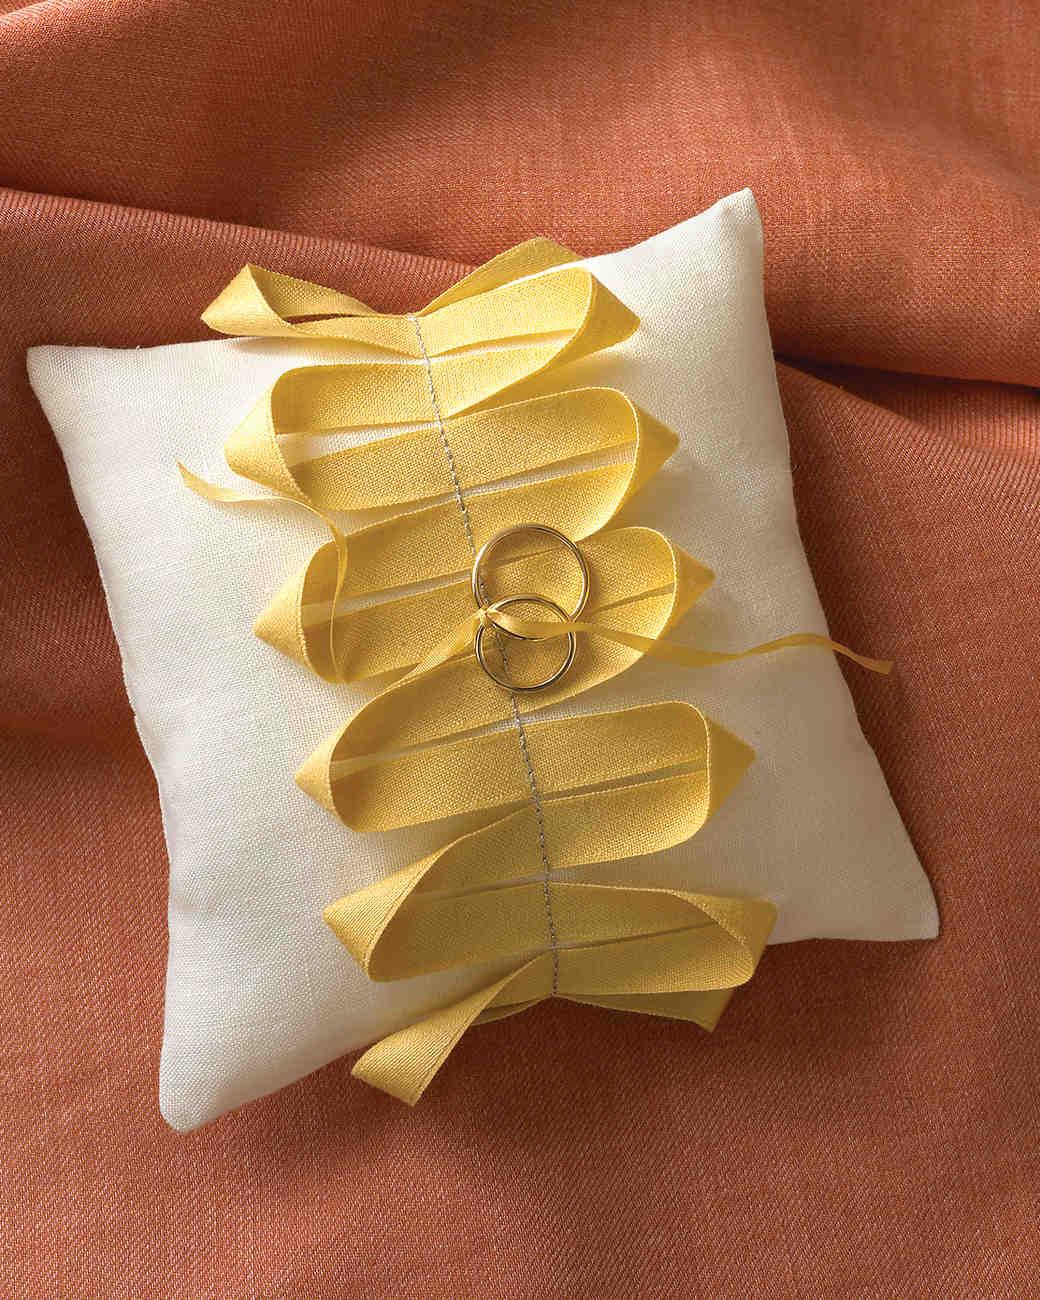 ring bearer pillow ideas you can make on your own martha stewart weddings & Ring Bearer Pillow. . Vintage Ring Bearer Pillows. Patterns For ... pillowsntoast.com